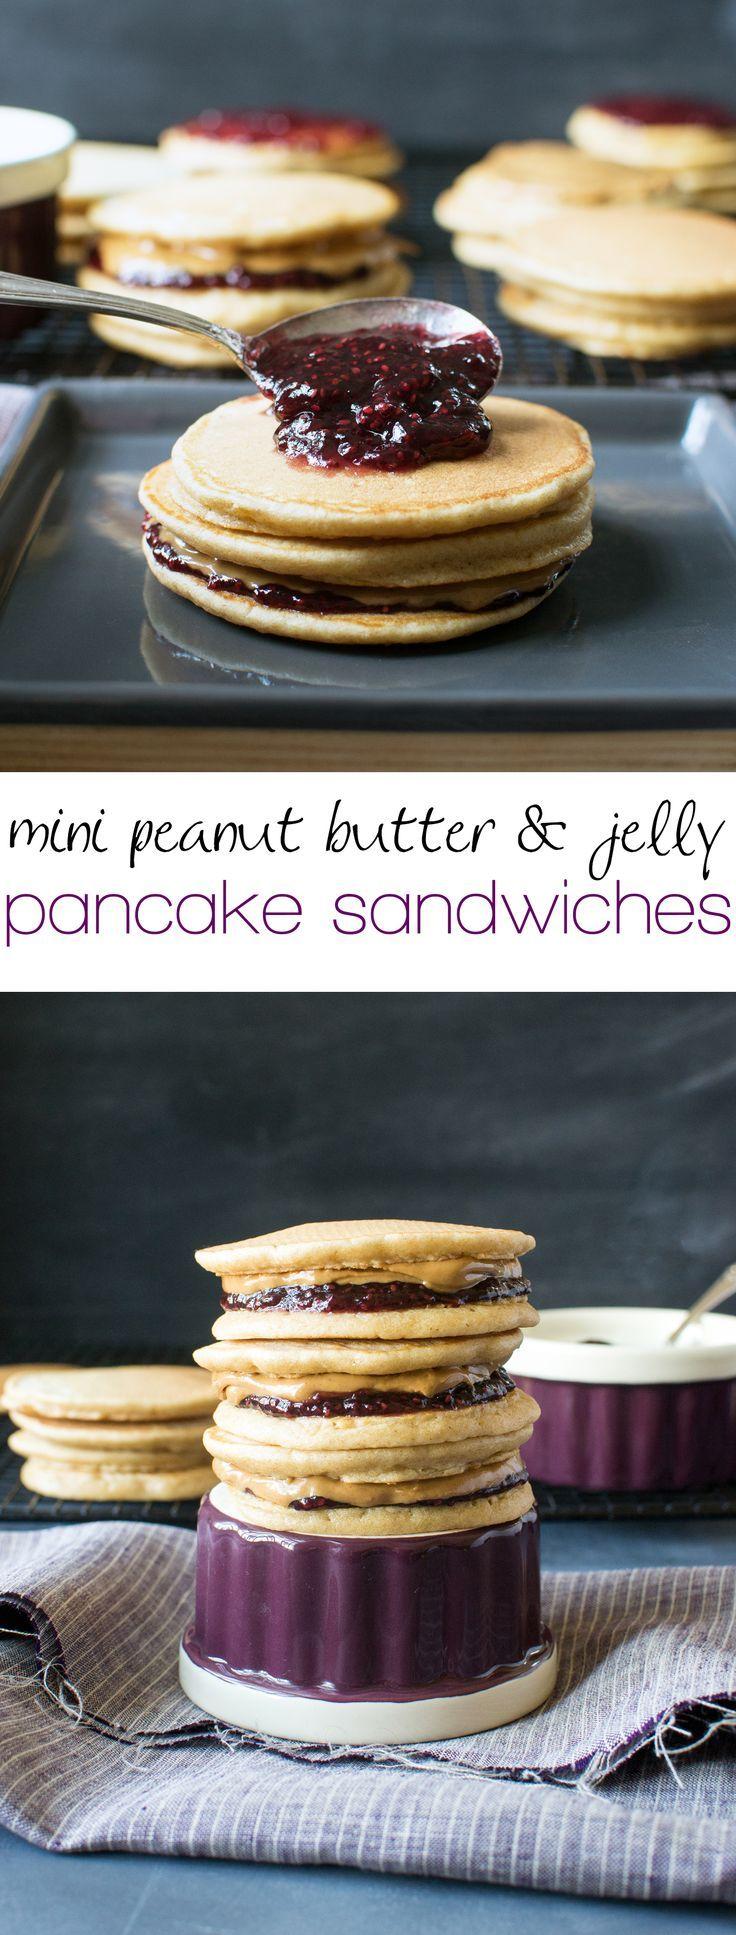 Mini peanut butter and jelly pancake sandwiches